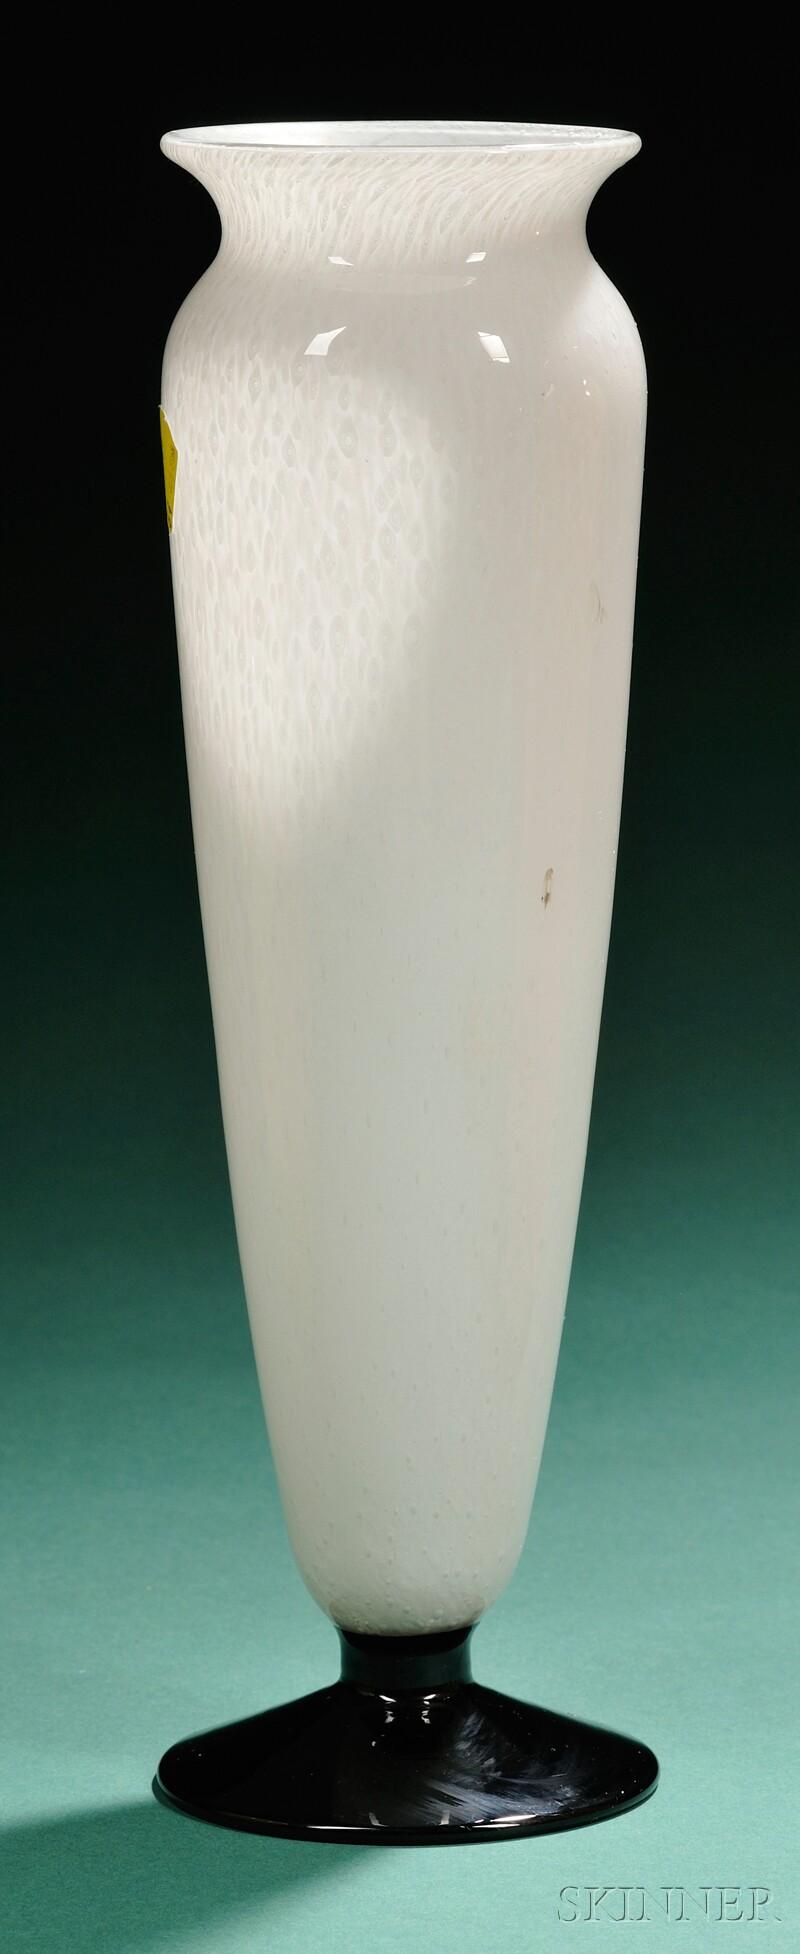 Kimble/Durand Art Deco Cluthra Glass Vase